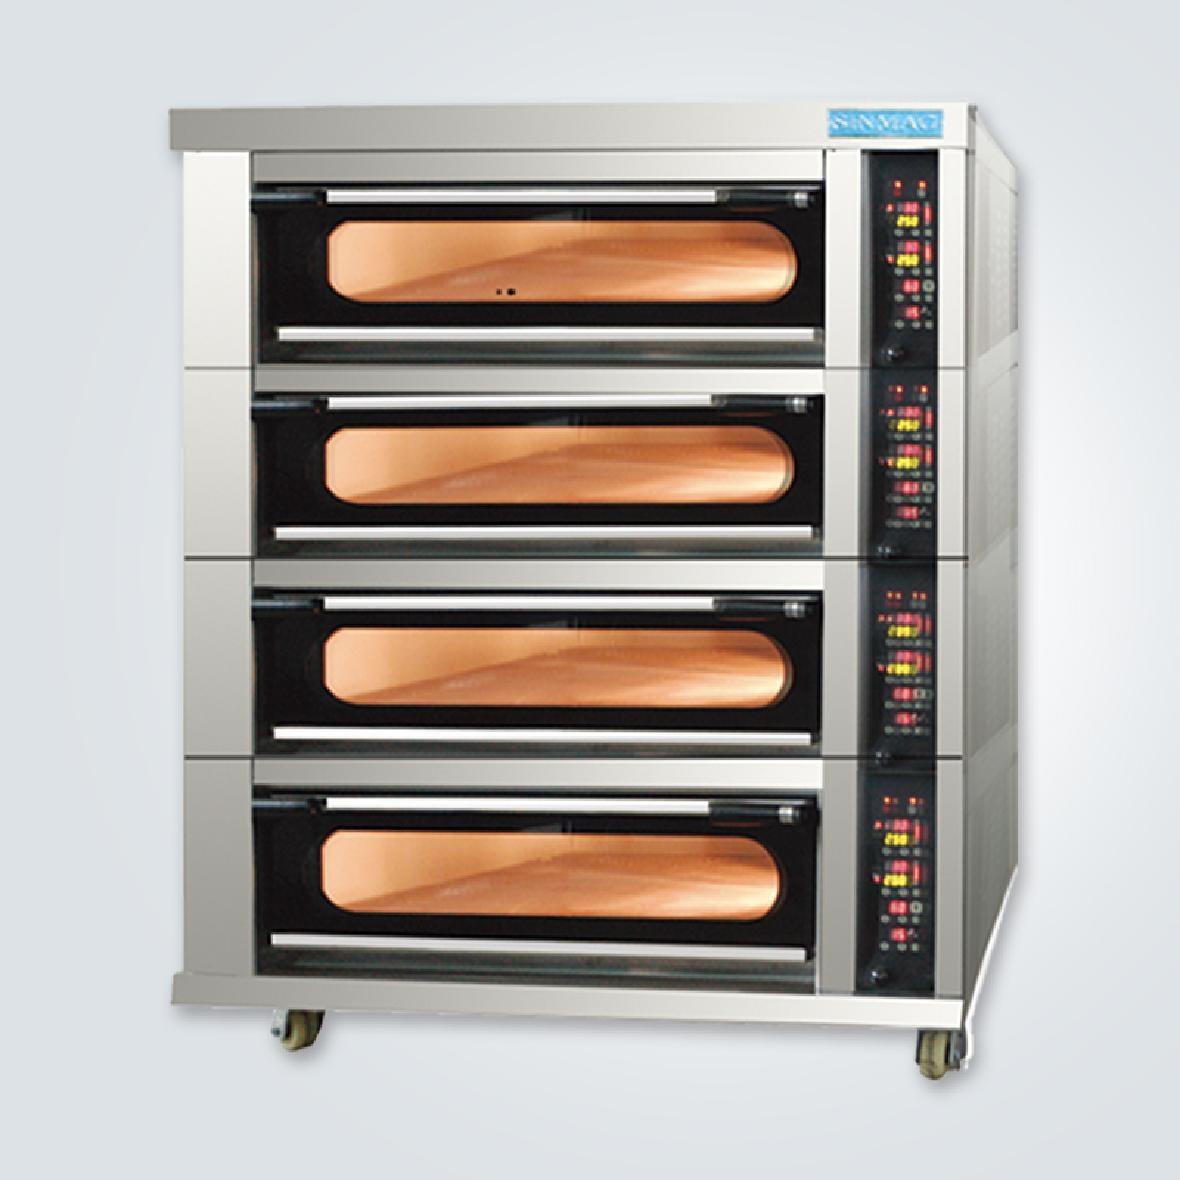 電烤爐 SK-934TG